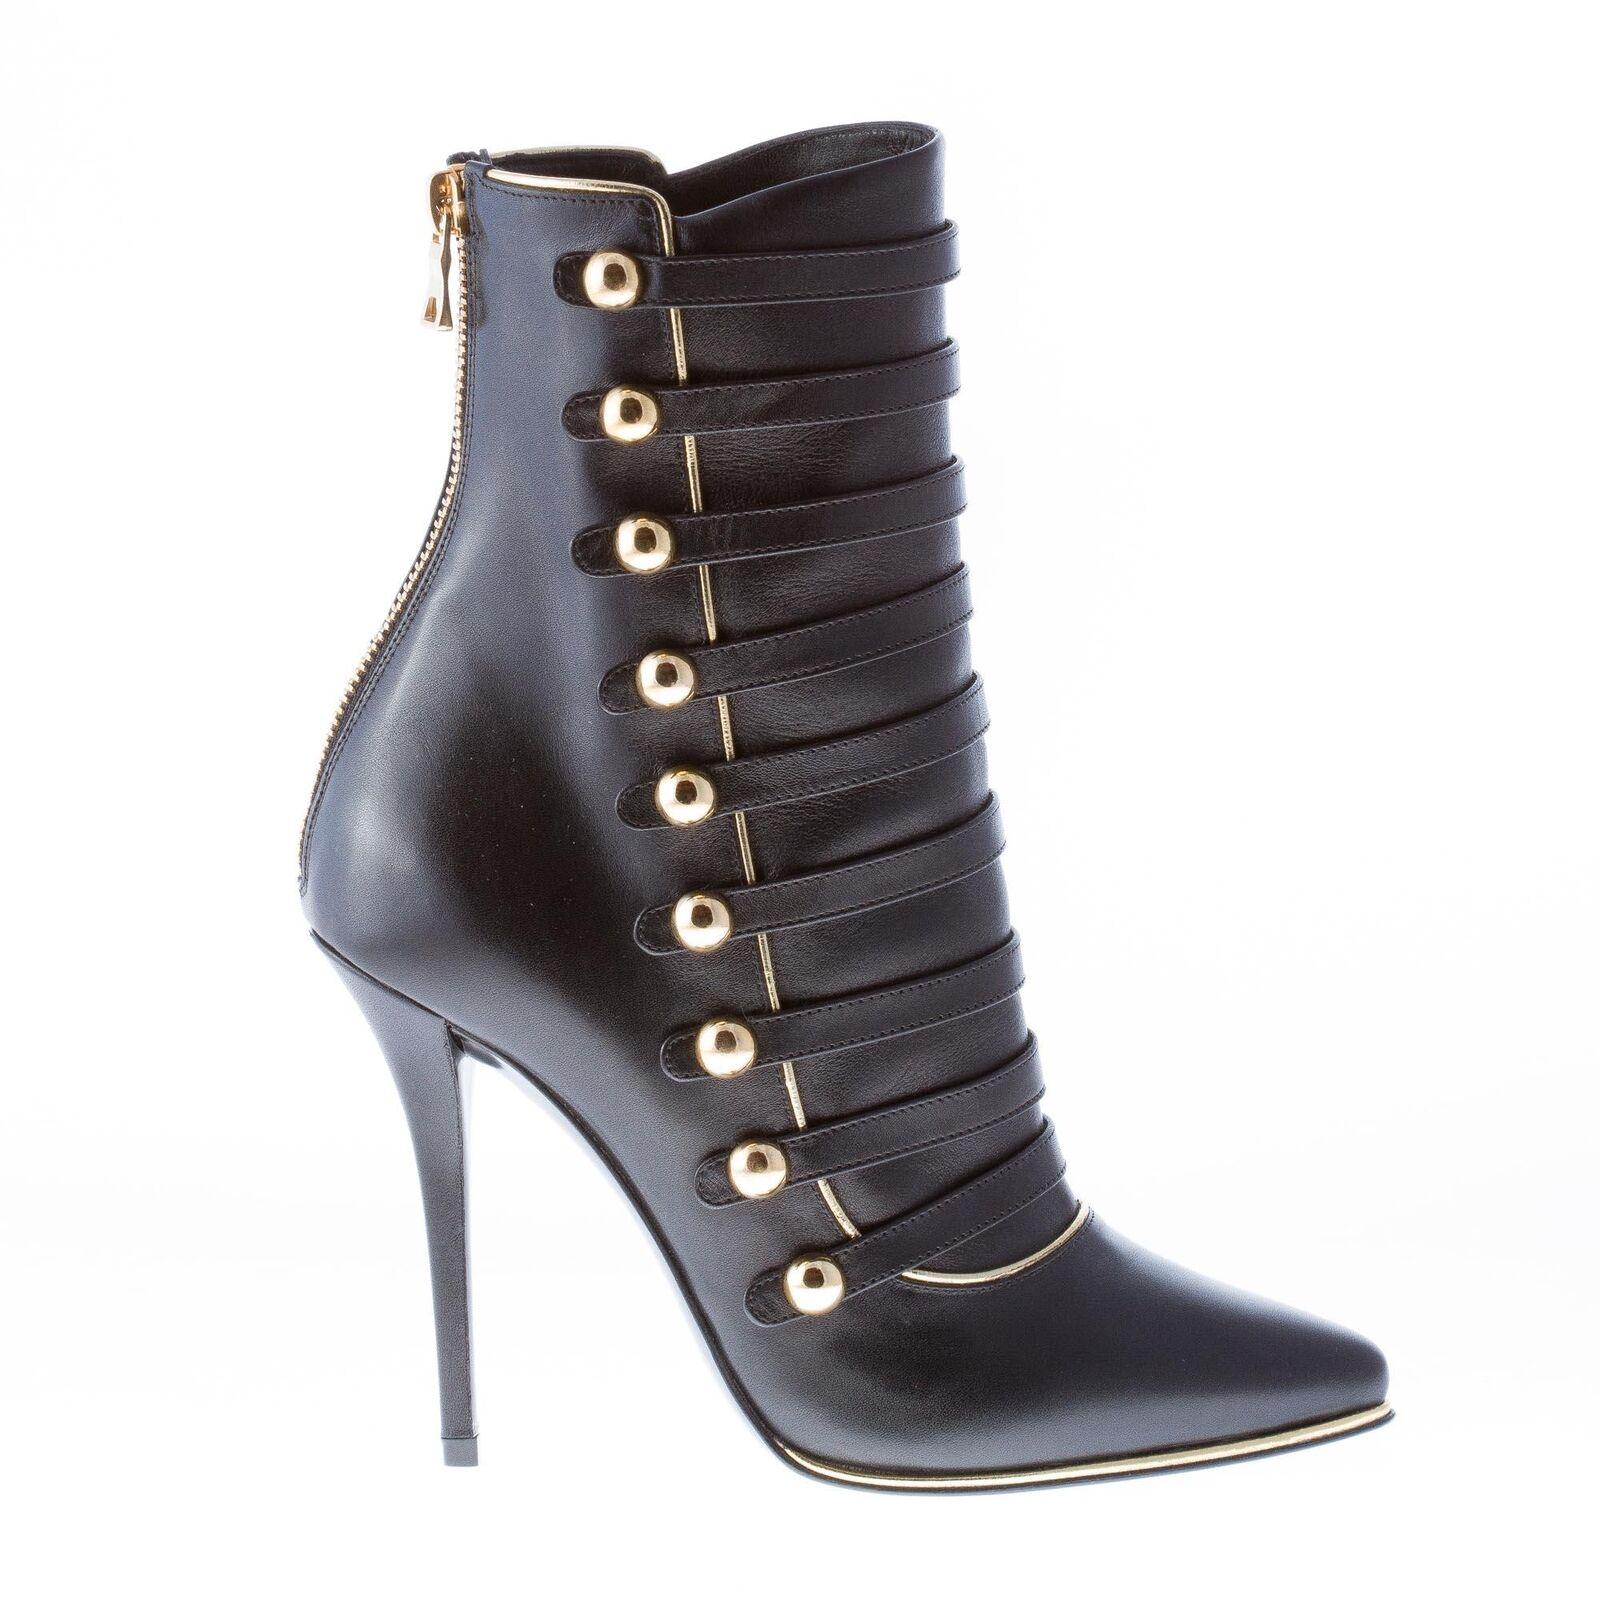 BALMAIN damen schuhe Alienor schwarz polished leather ankle ankle ankle Stiefel Gold studs straps 65823b